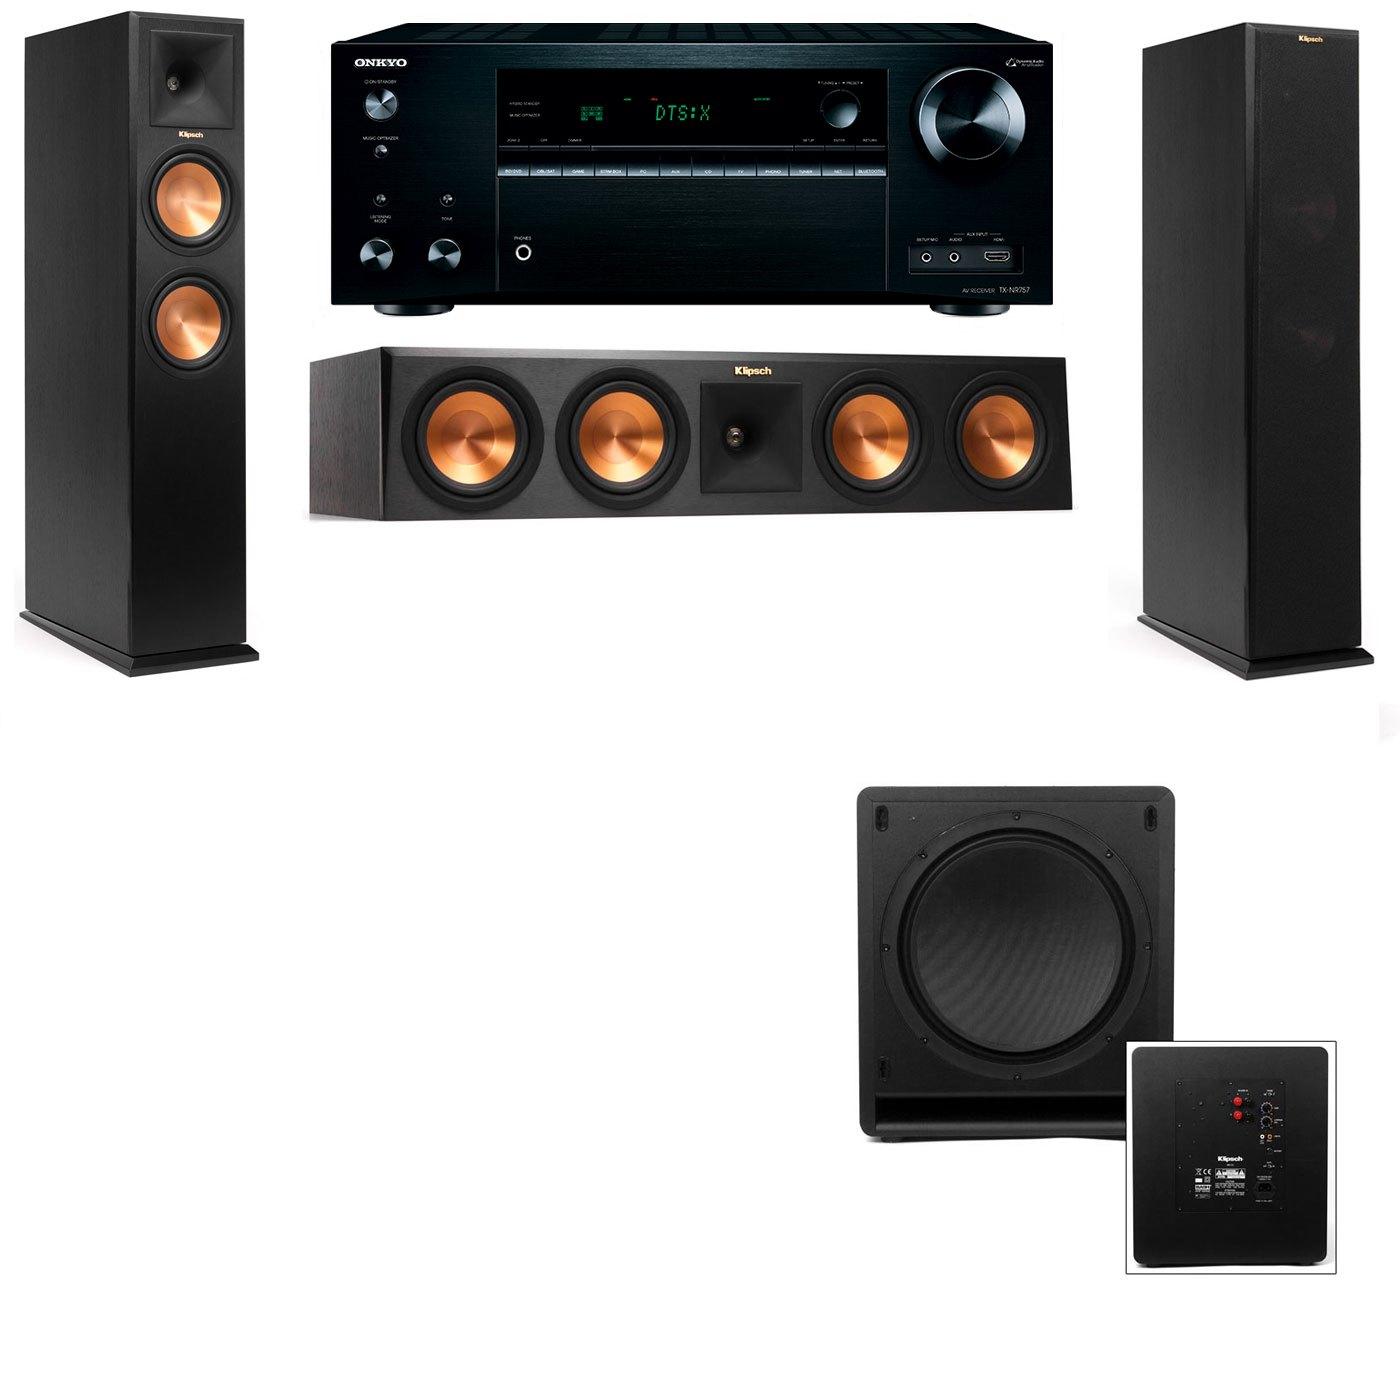 Klipsch RP-250F Tower Speakers-SW-112-3.1-Onkyo TX-NR757